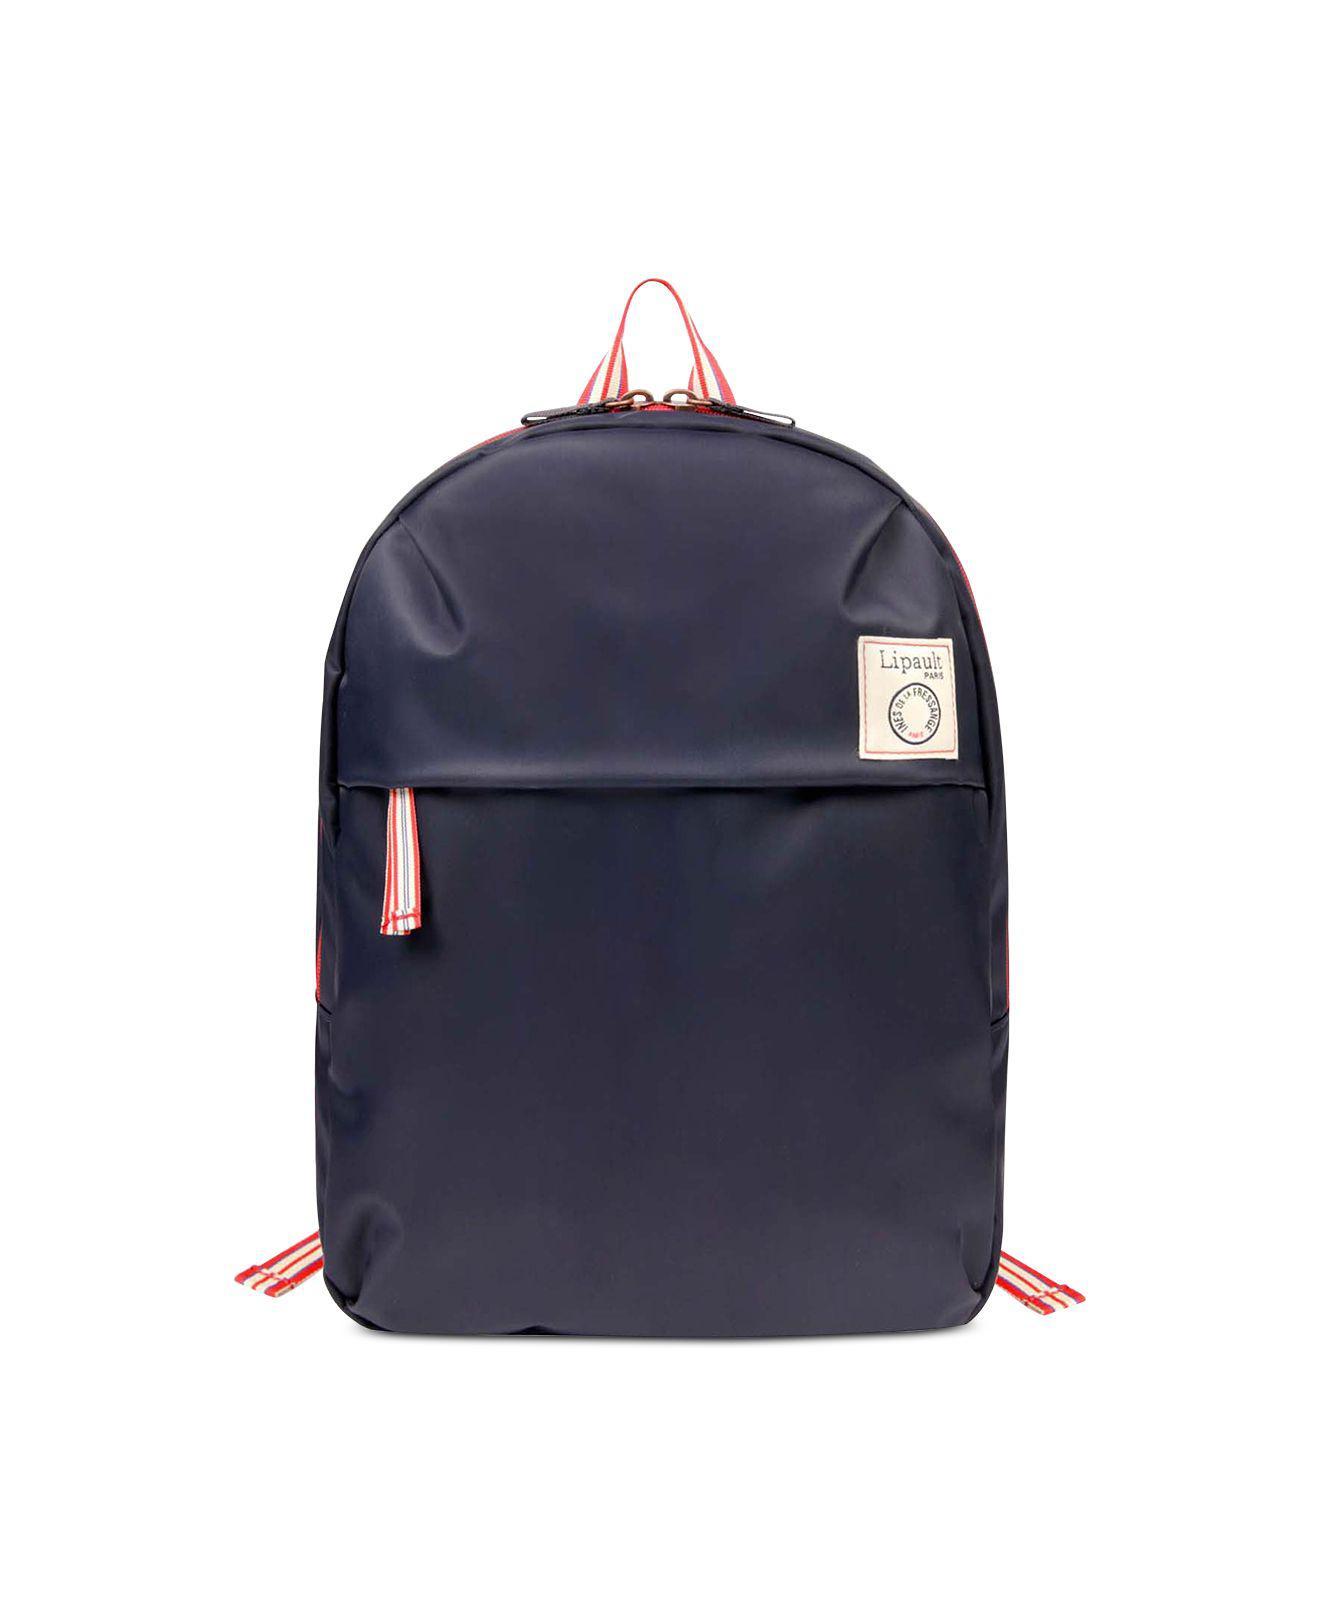 Lyst - Lipault Ines De La Fressange Backpack in Blue 87daf98b42f7d